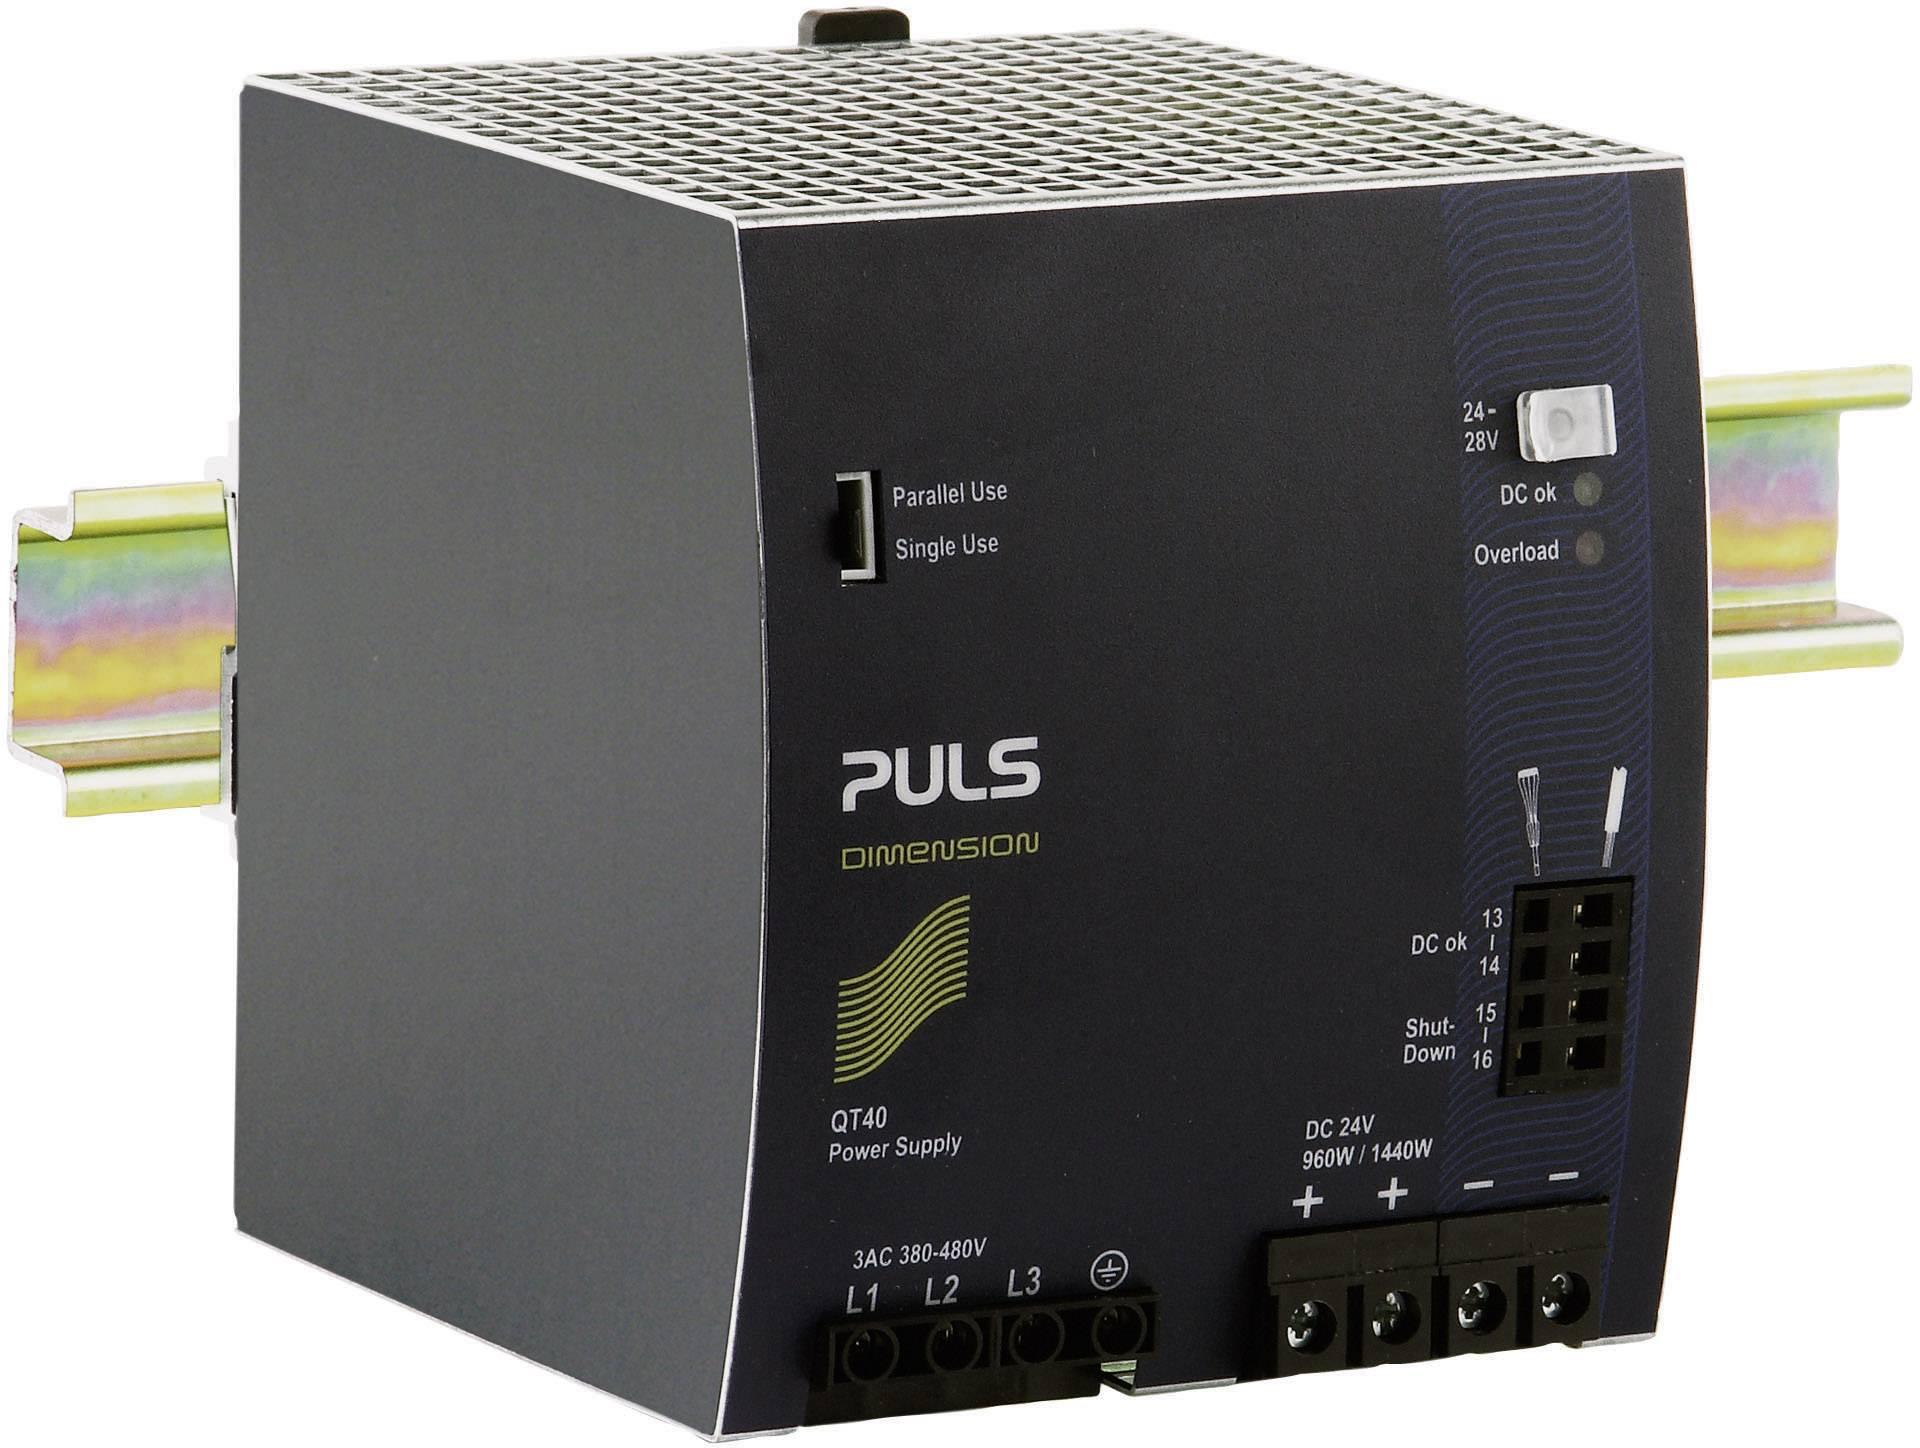 Sieťový zdroj na montážnu lištu (DIN lištu) PULS DIMENSION QT40.241, 1 x, 24 V/DC, 40 A, 1440 W